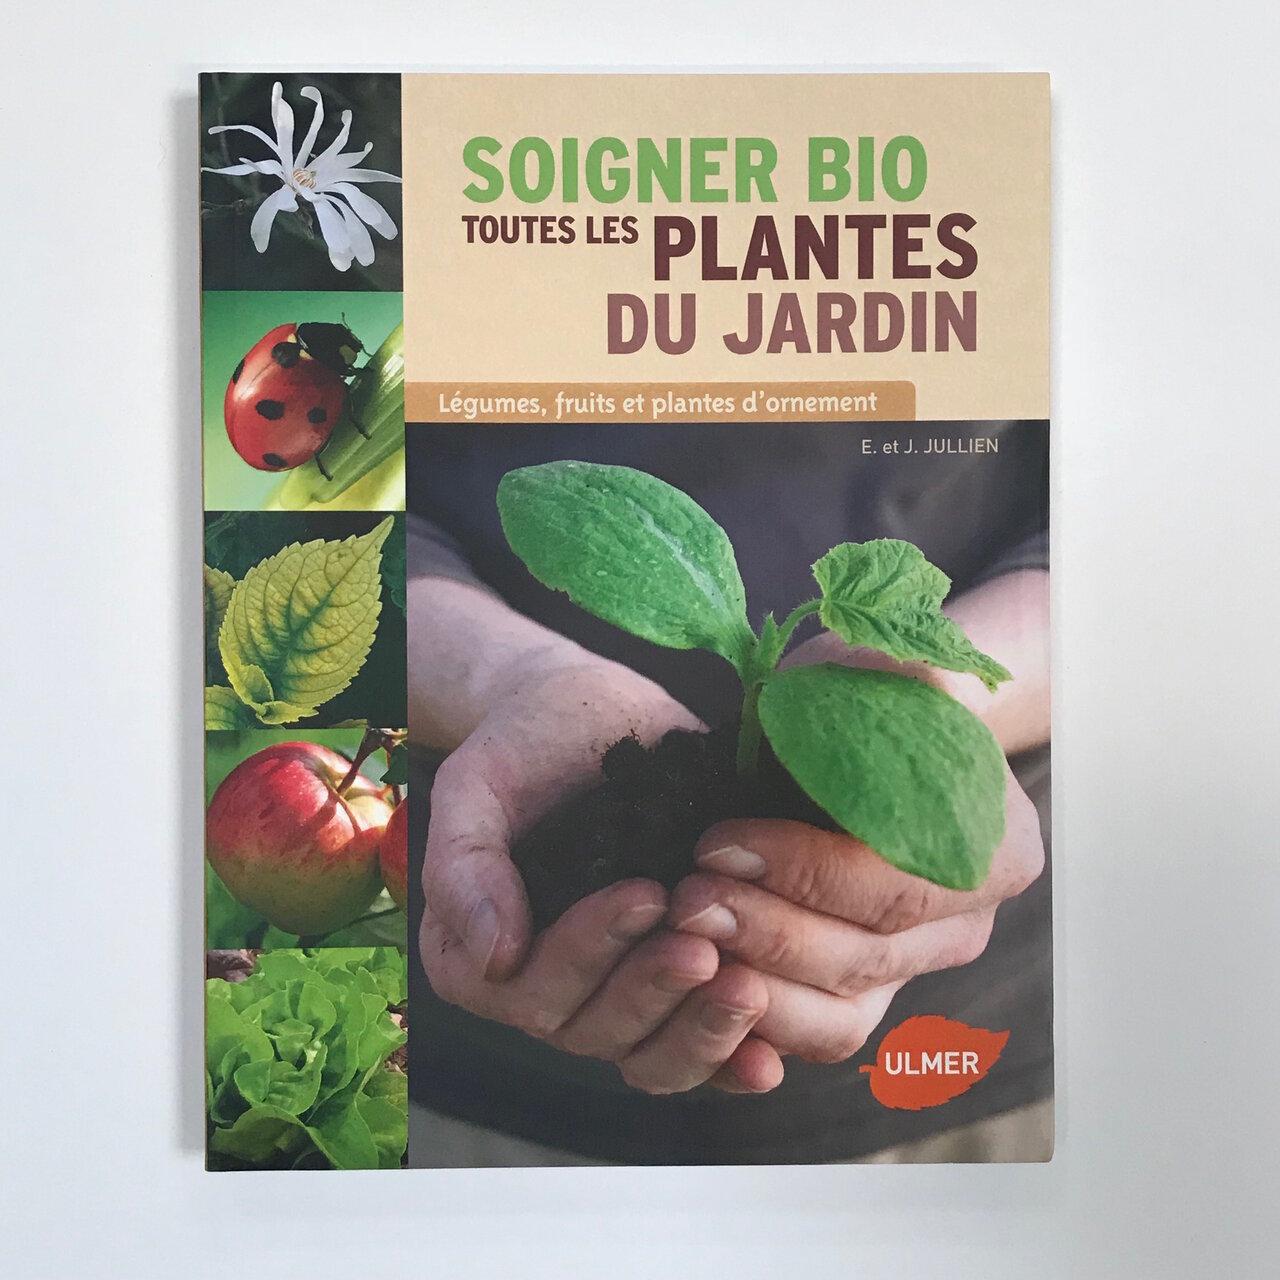 Jardinage - Soigner Bio toutes les plantes du jardin